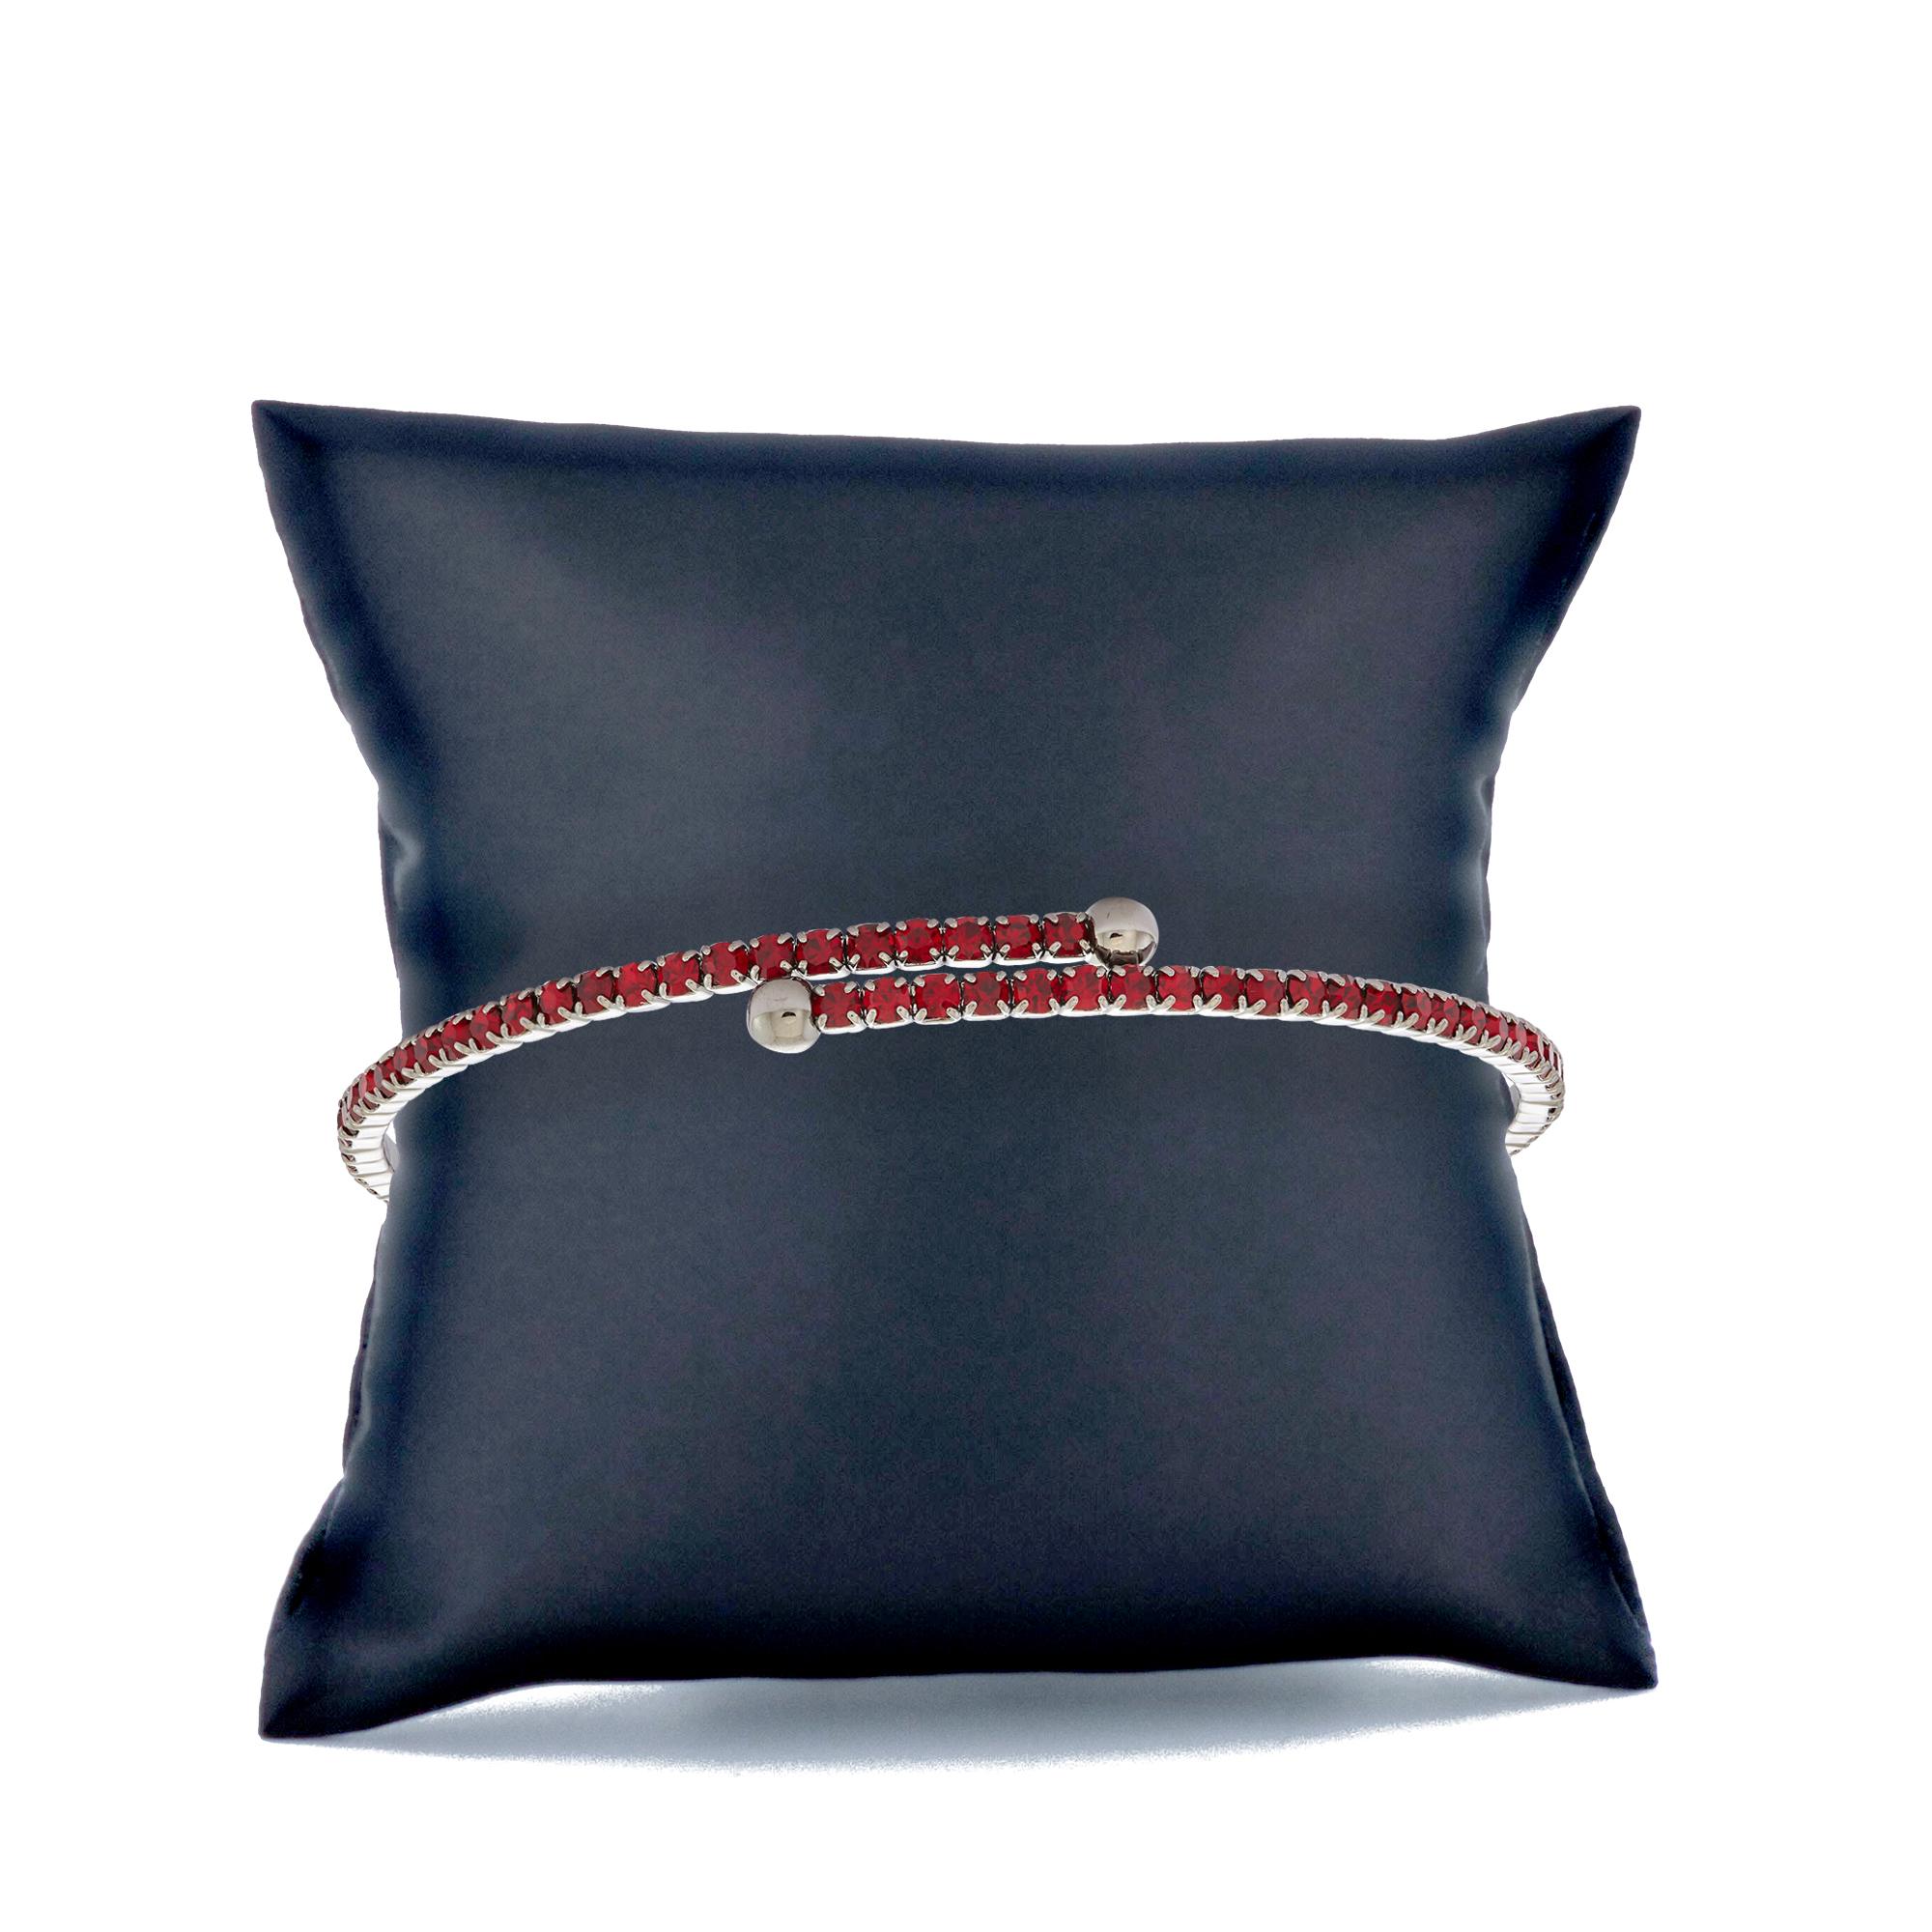 Womens-Ladies-Fashion-Accessories-Jewelry-Black-Rhodium-Plated-Bangle-Bracelet thumbnail 43